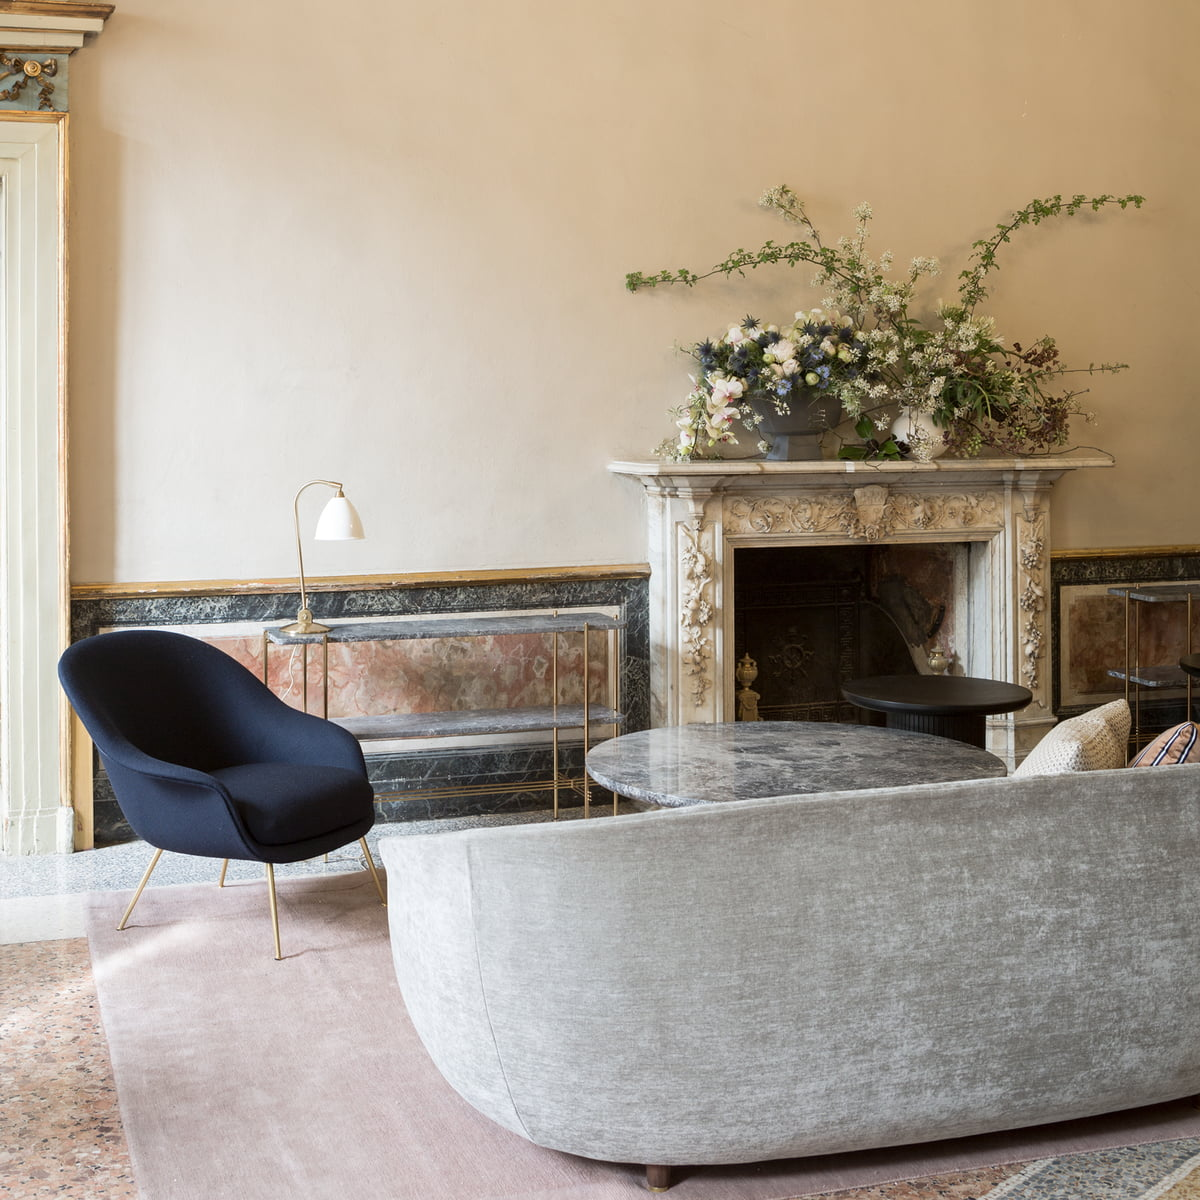 Gubi – Bat Lounge Chair, lav ryg, messingHallingdal 116